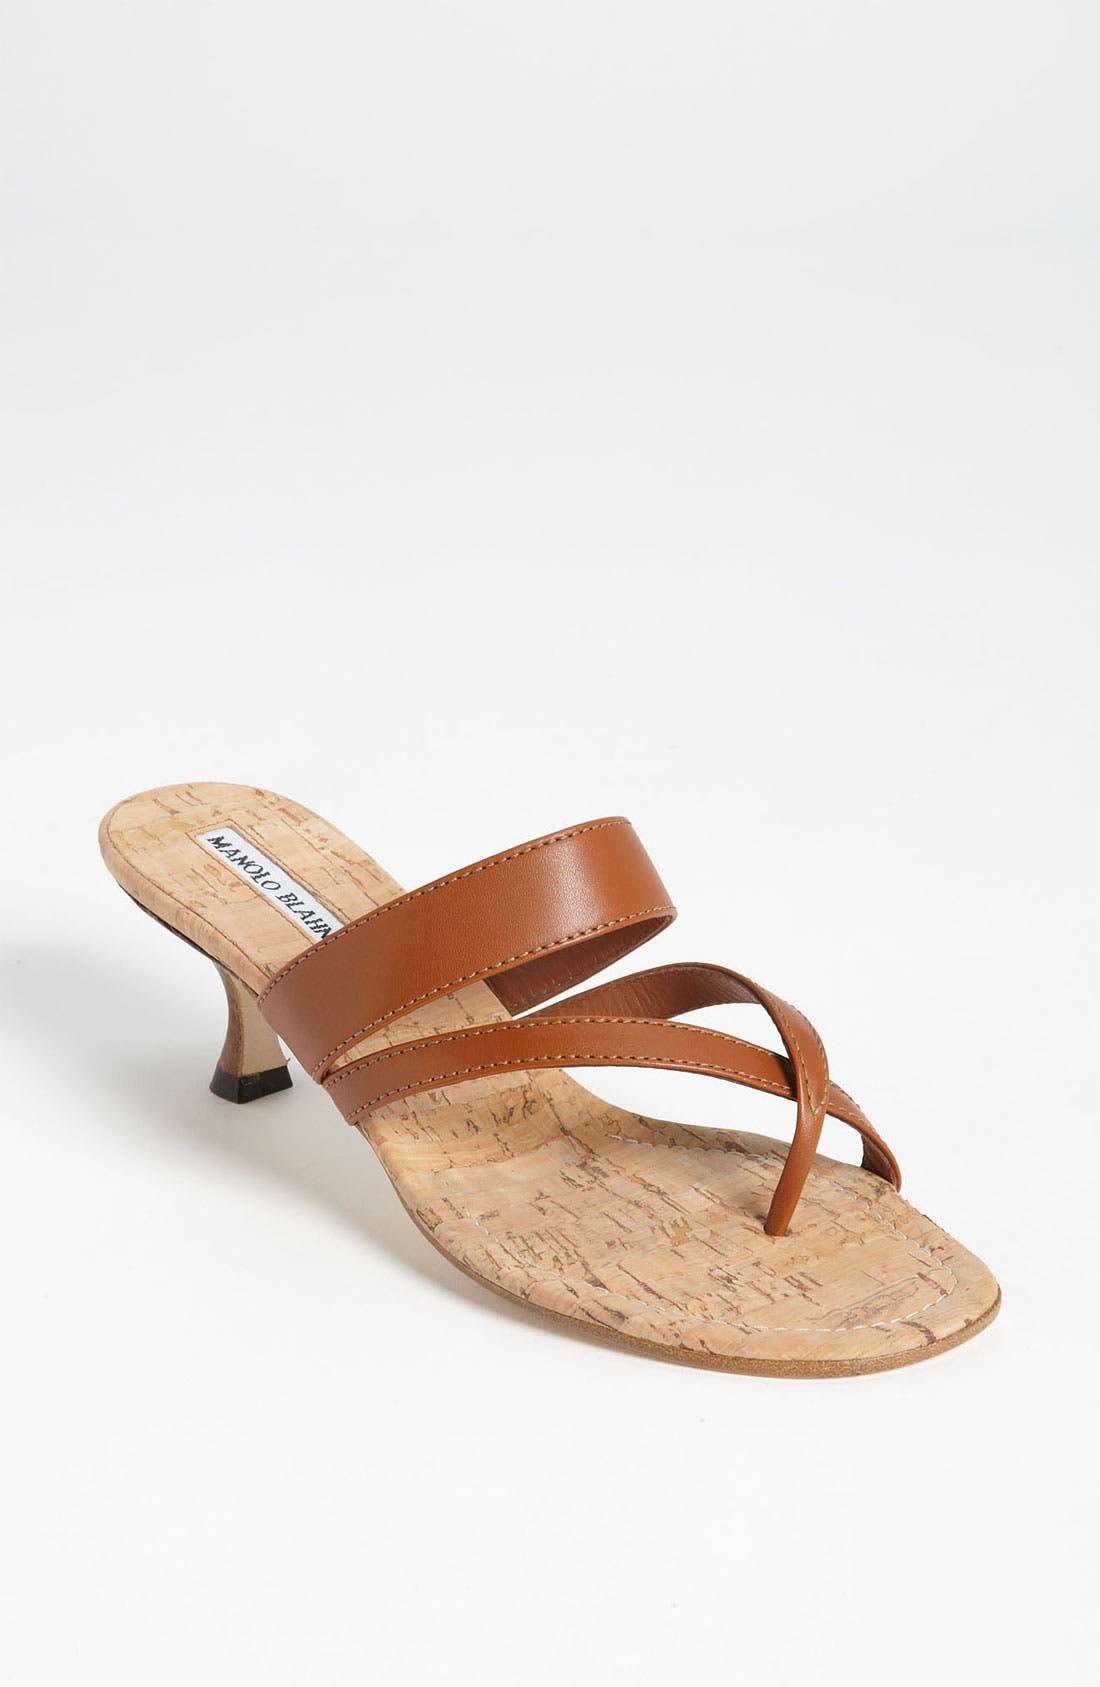 Main Image - Manolo Blahnik 'Susa' Sandal